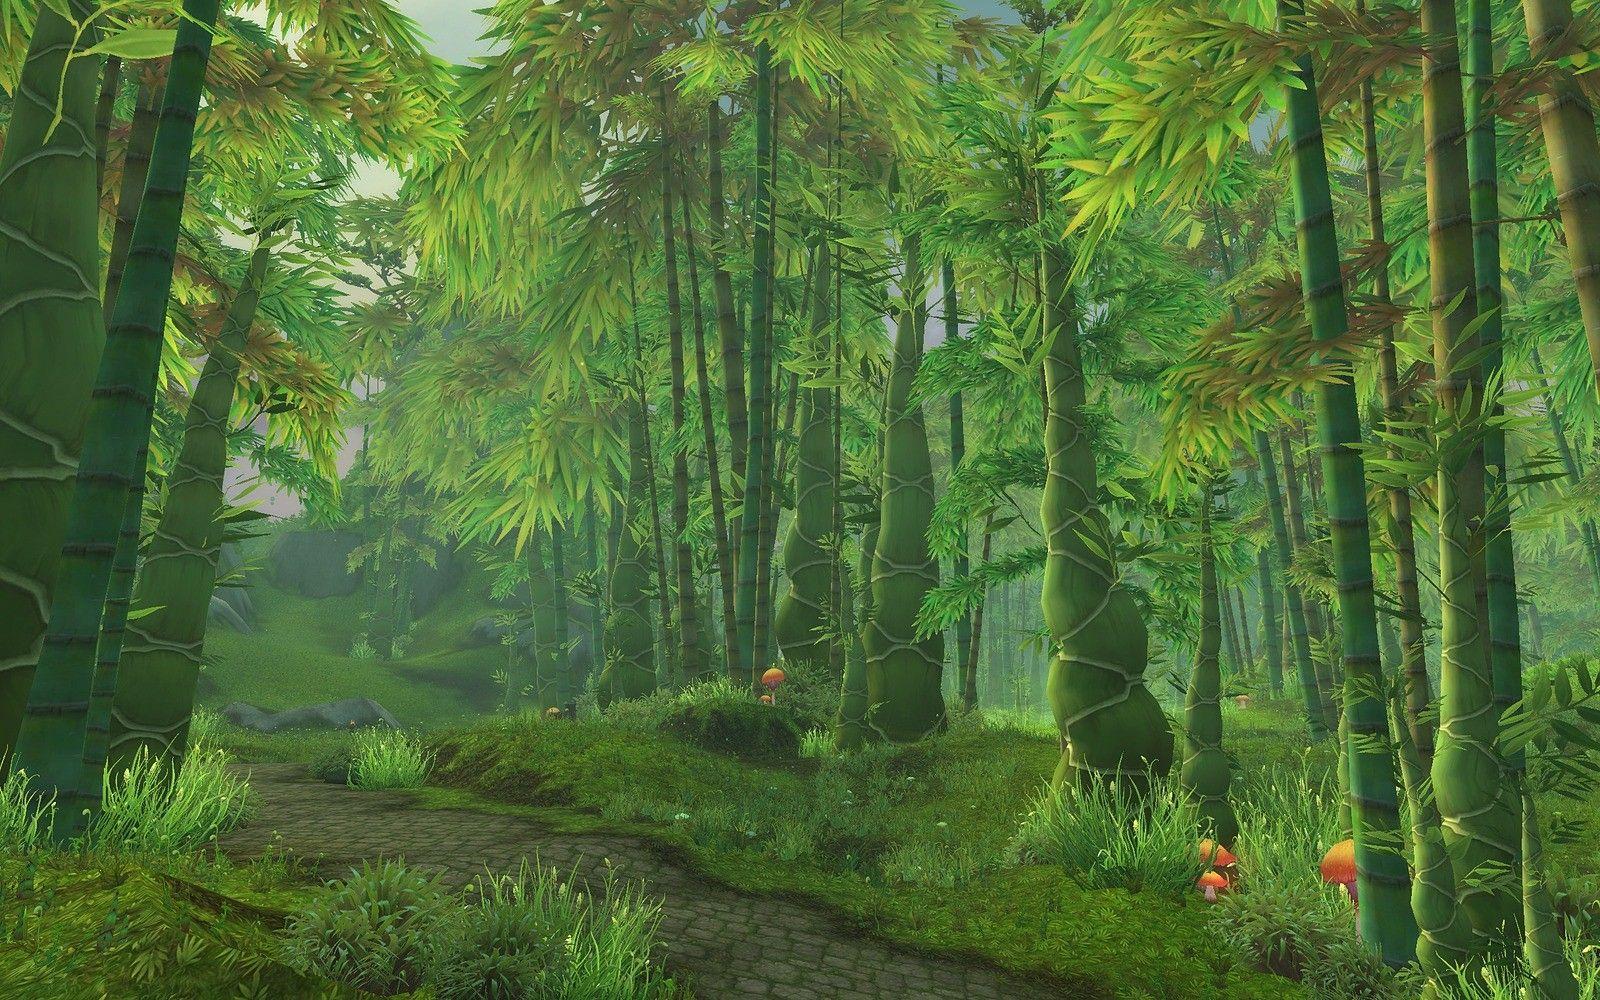 Jungle Wallpaper World Of Warcraft: World Of Warcraft: Mists Of Pandaria